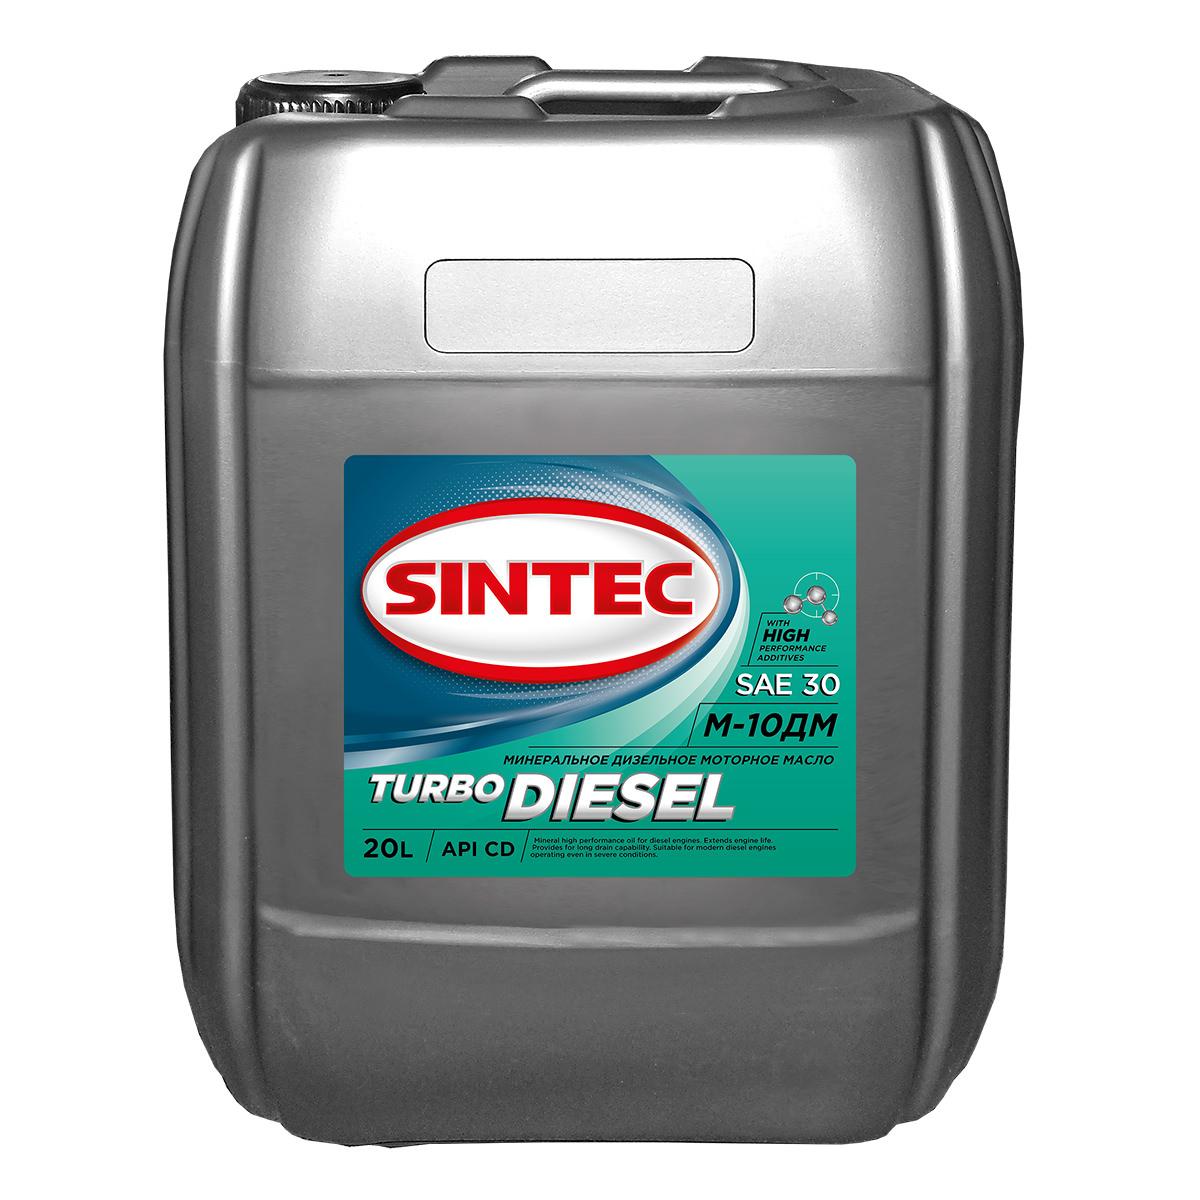 SINTEC TURBO DIESEL М10ДМ API CD